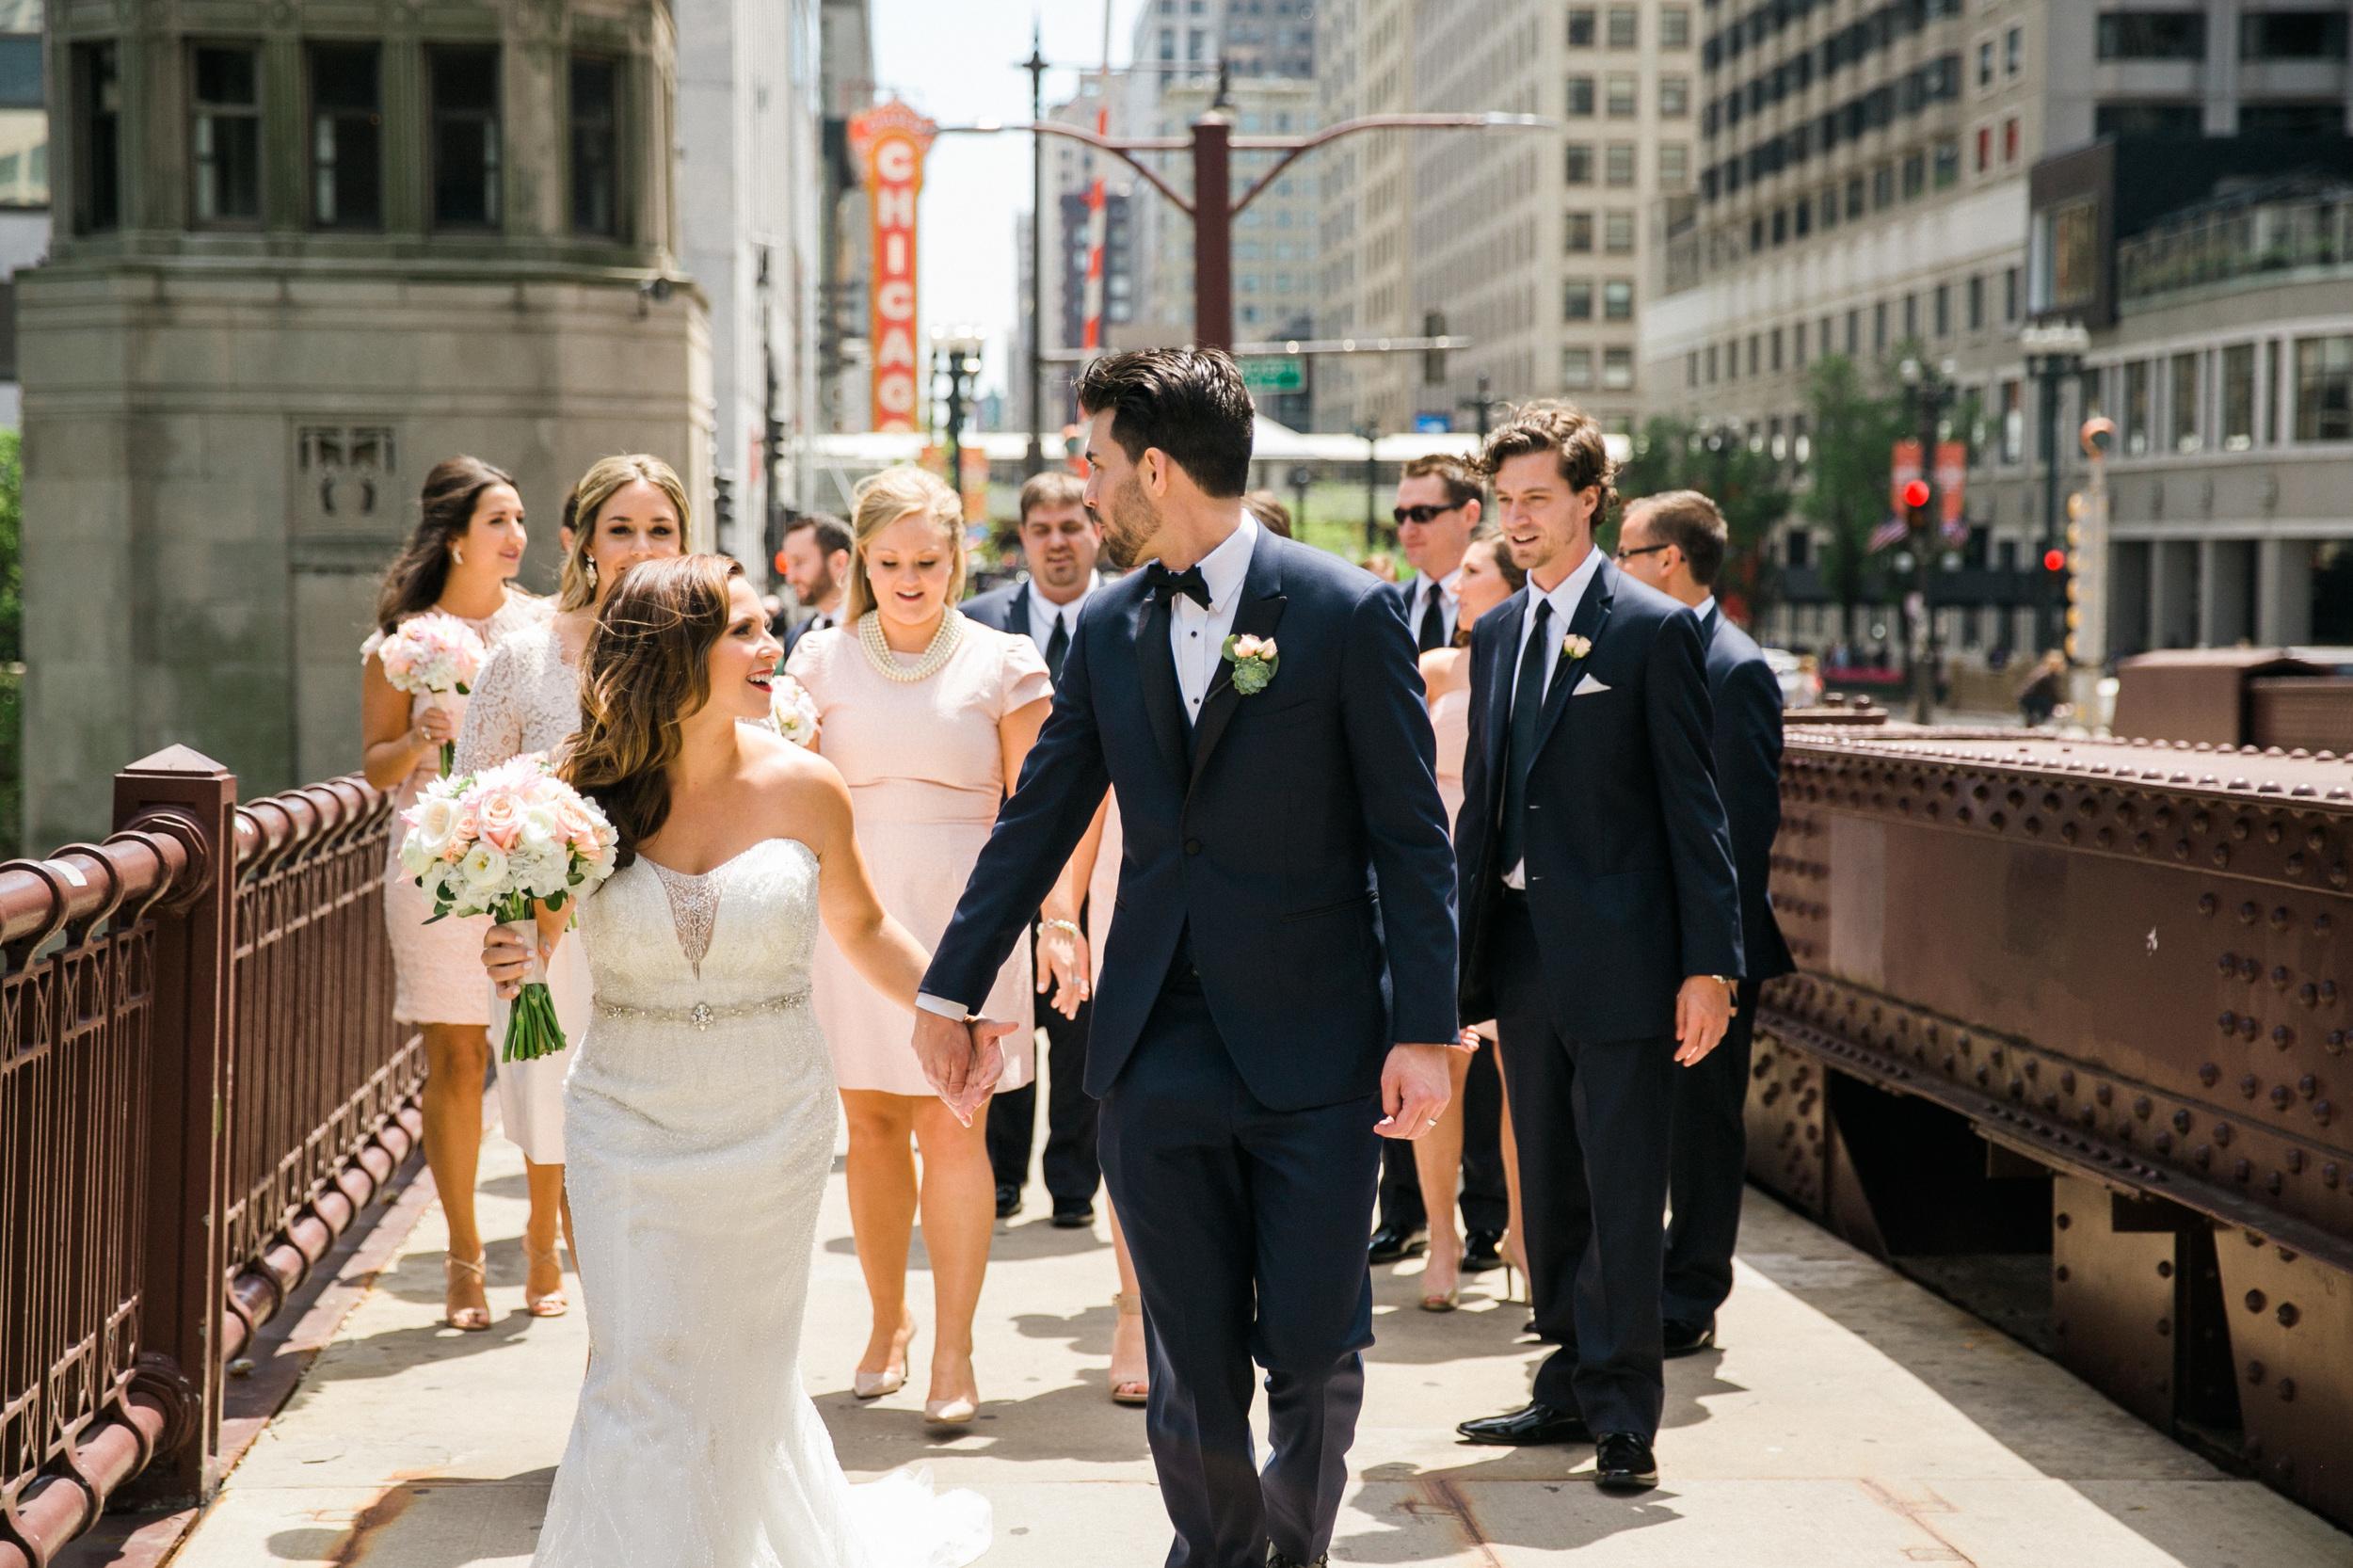 mayden_photography_weddings-46.jpg